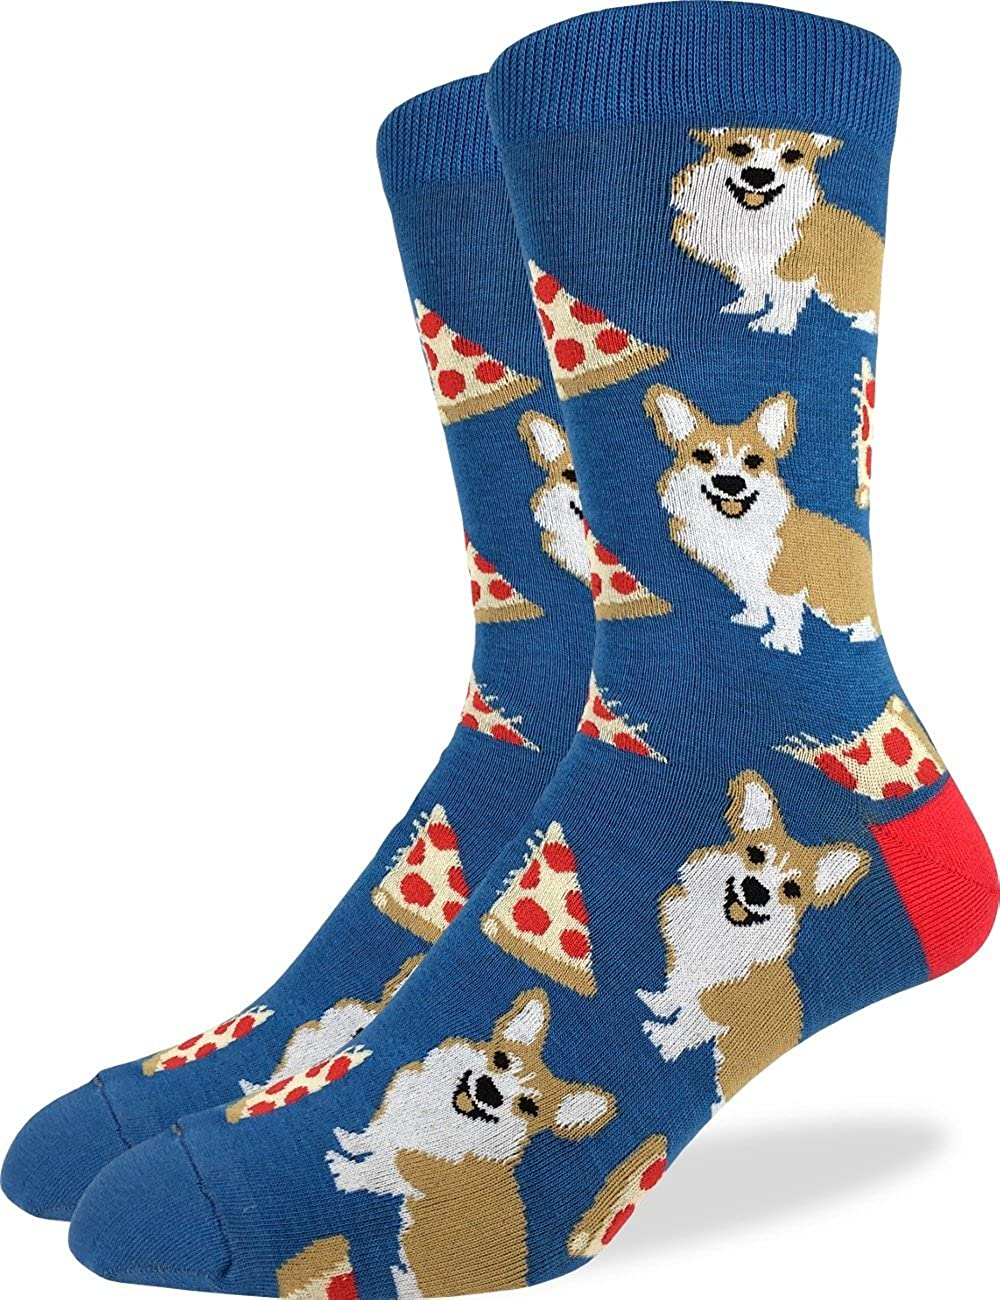 Good Luck Sock Men's Corgi Pizza Crew Socks - Blue, Shoe Size 7-12 1331